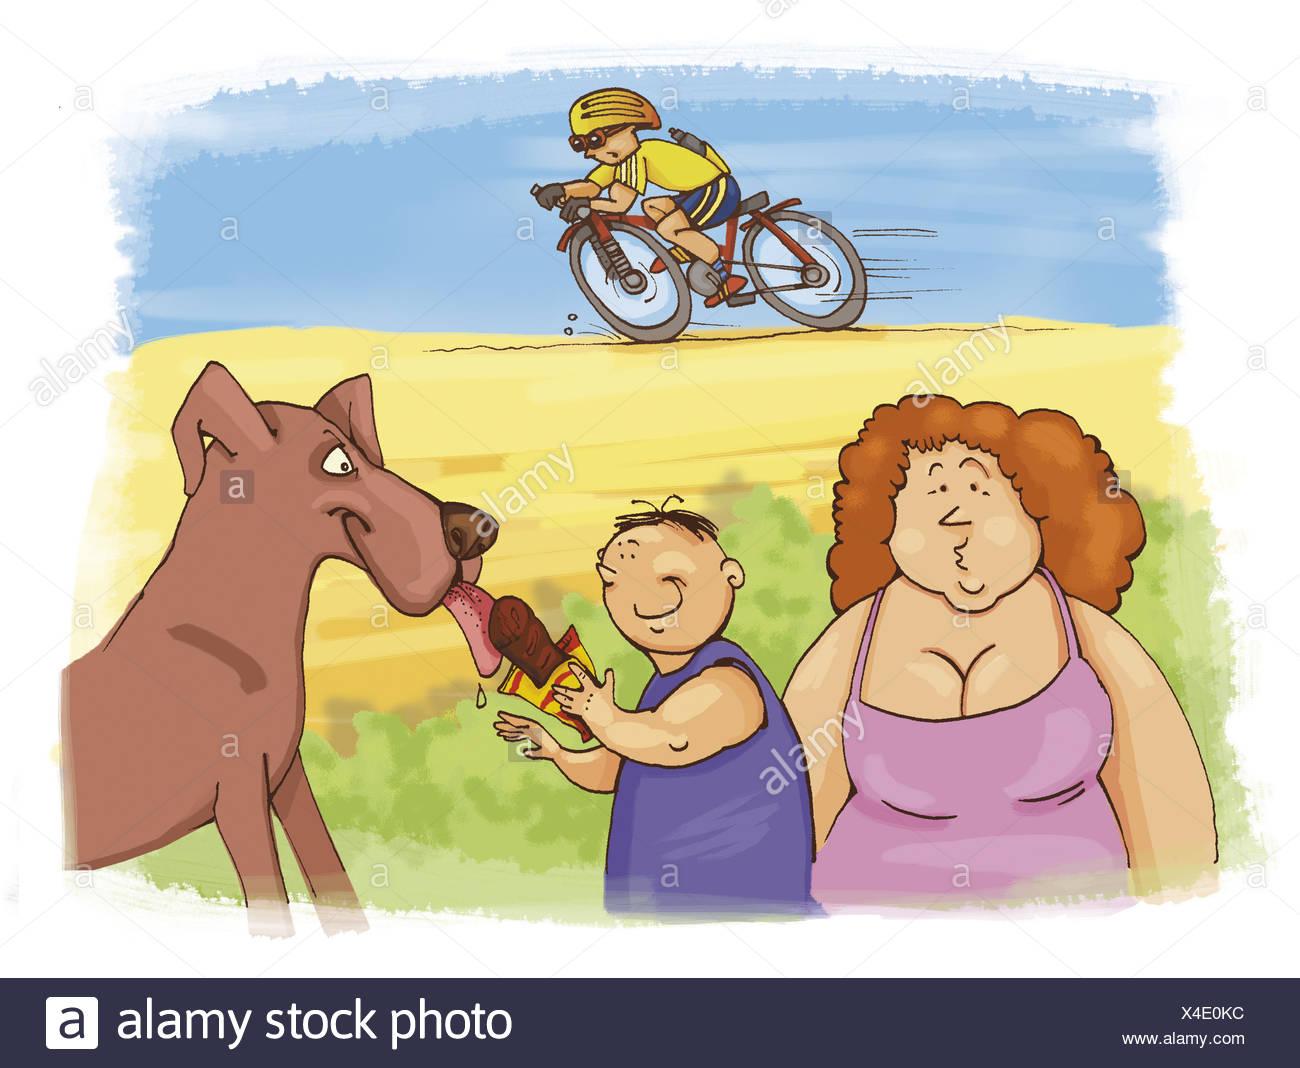 White Black Art His Boy Bike Riding Clip And